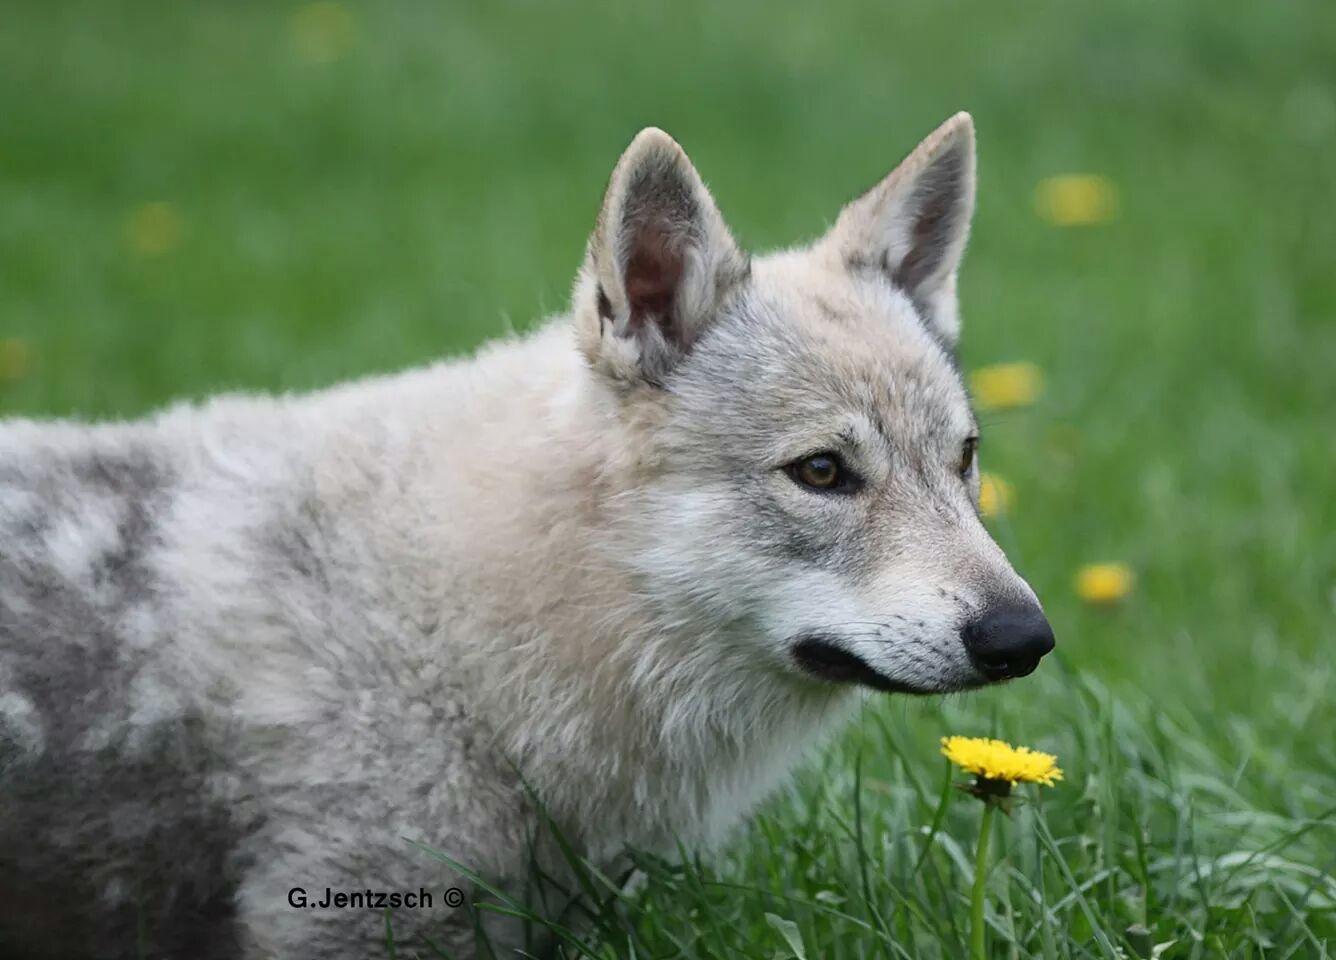 Monchi Tschechoslowakischer Wolfshund Pawshake